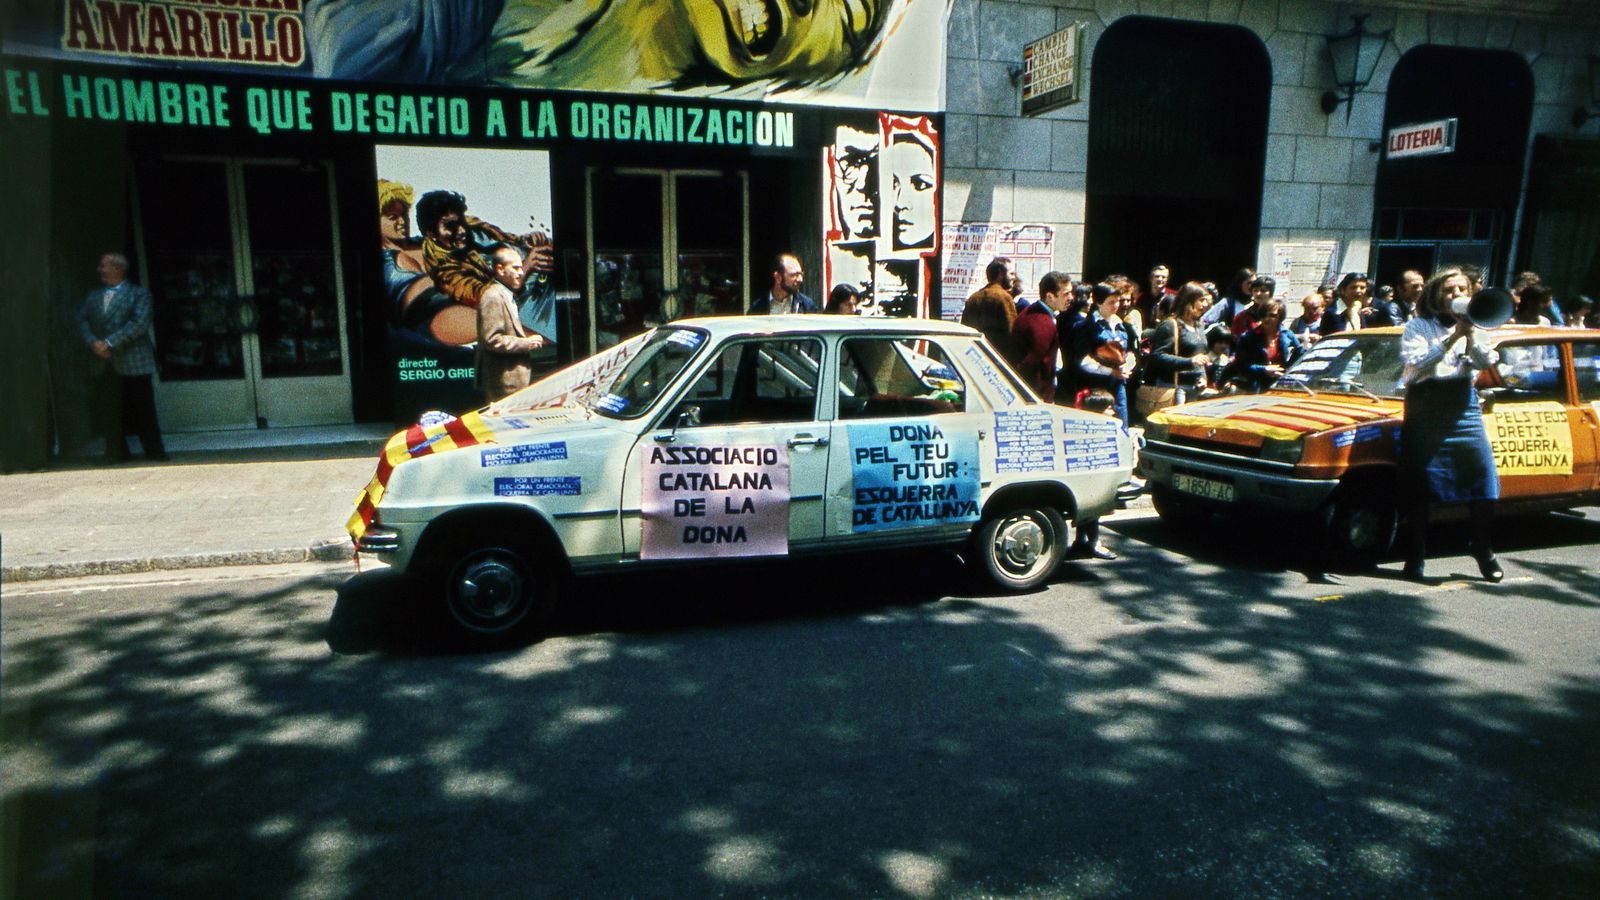 Un cotxe amb pancartes feministes